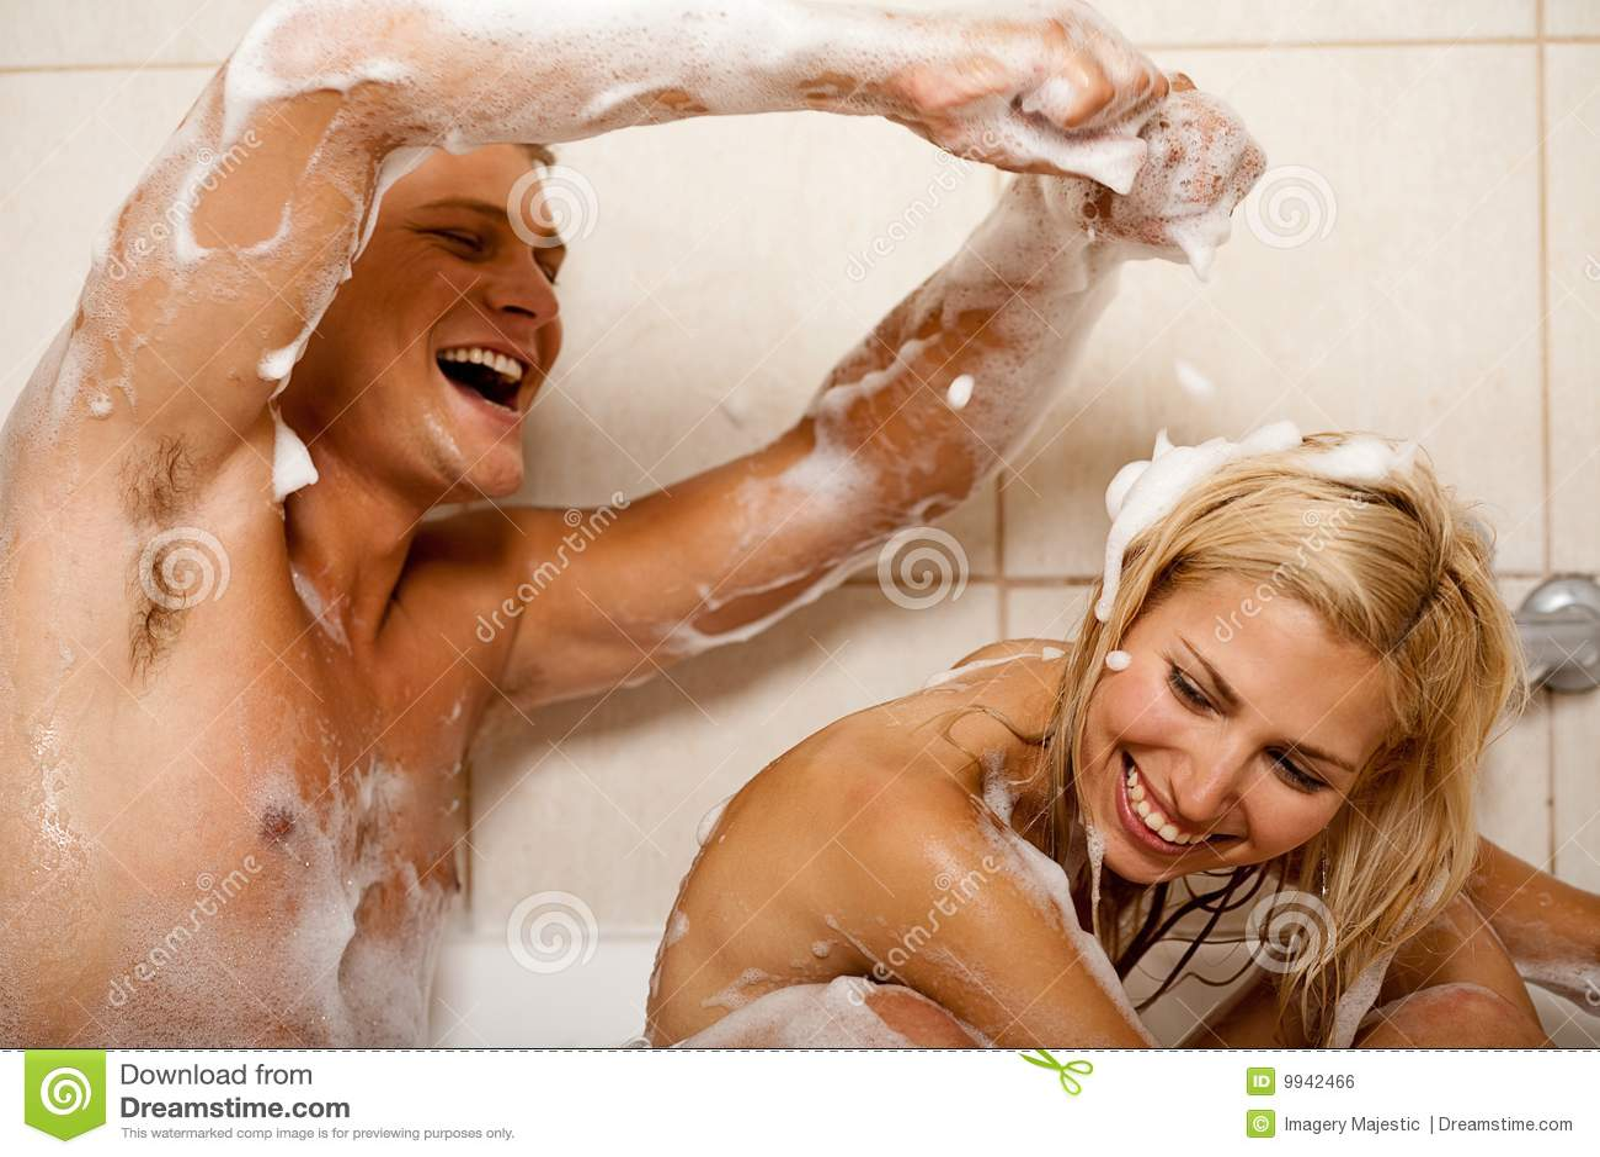 Two girls sex shower